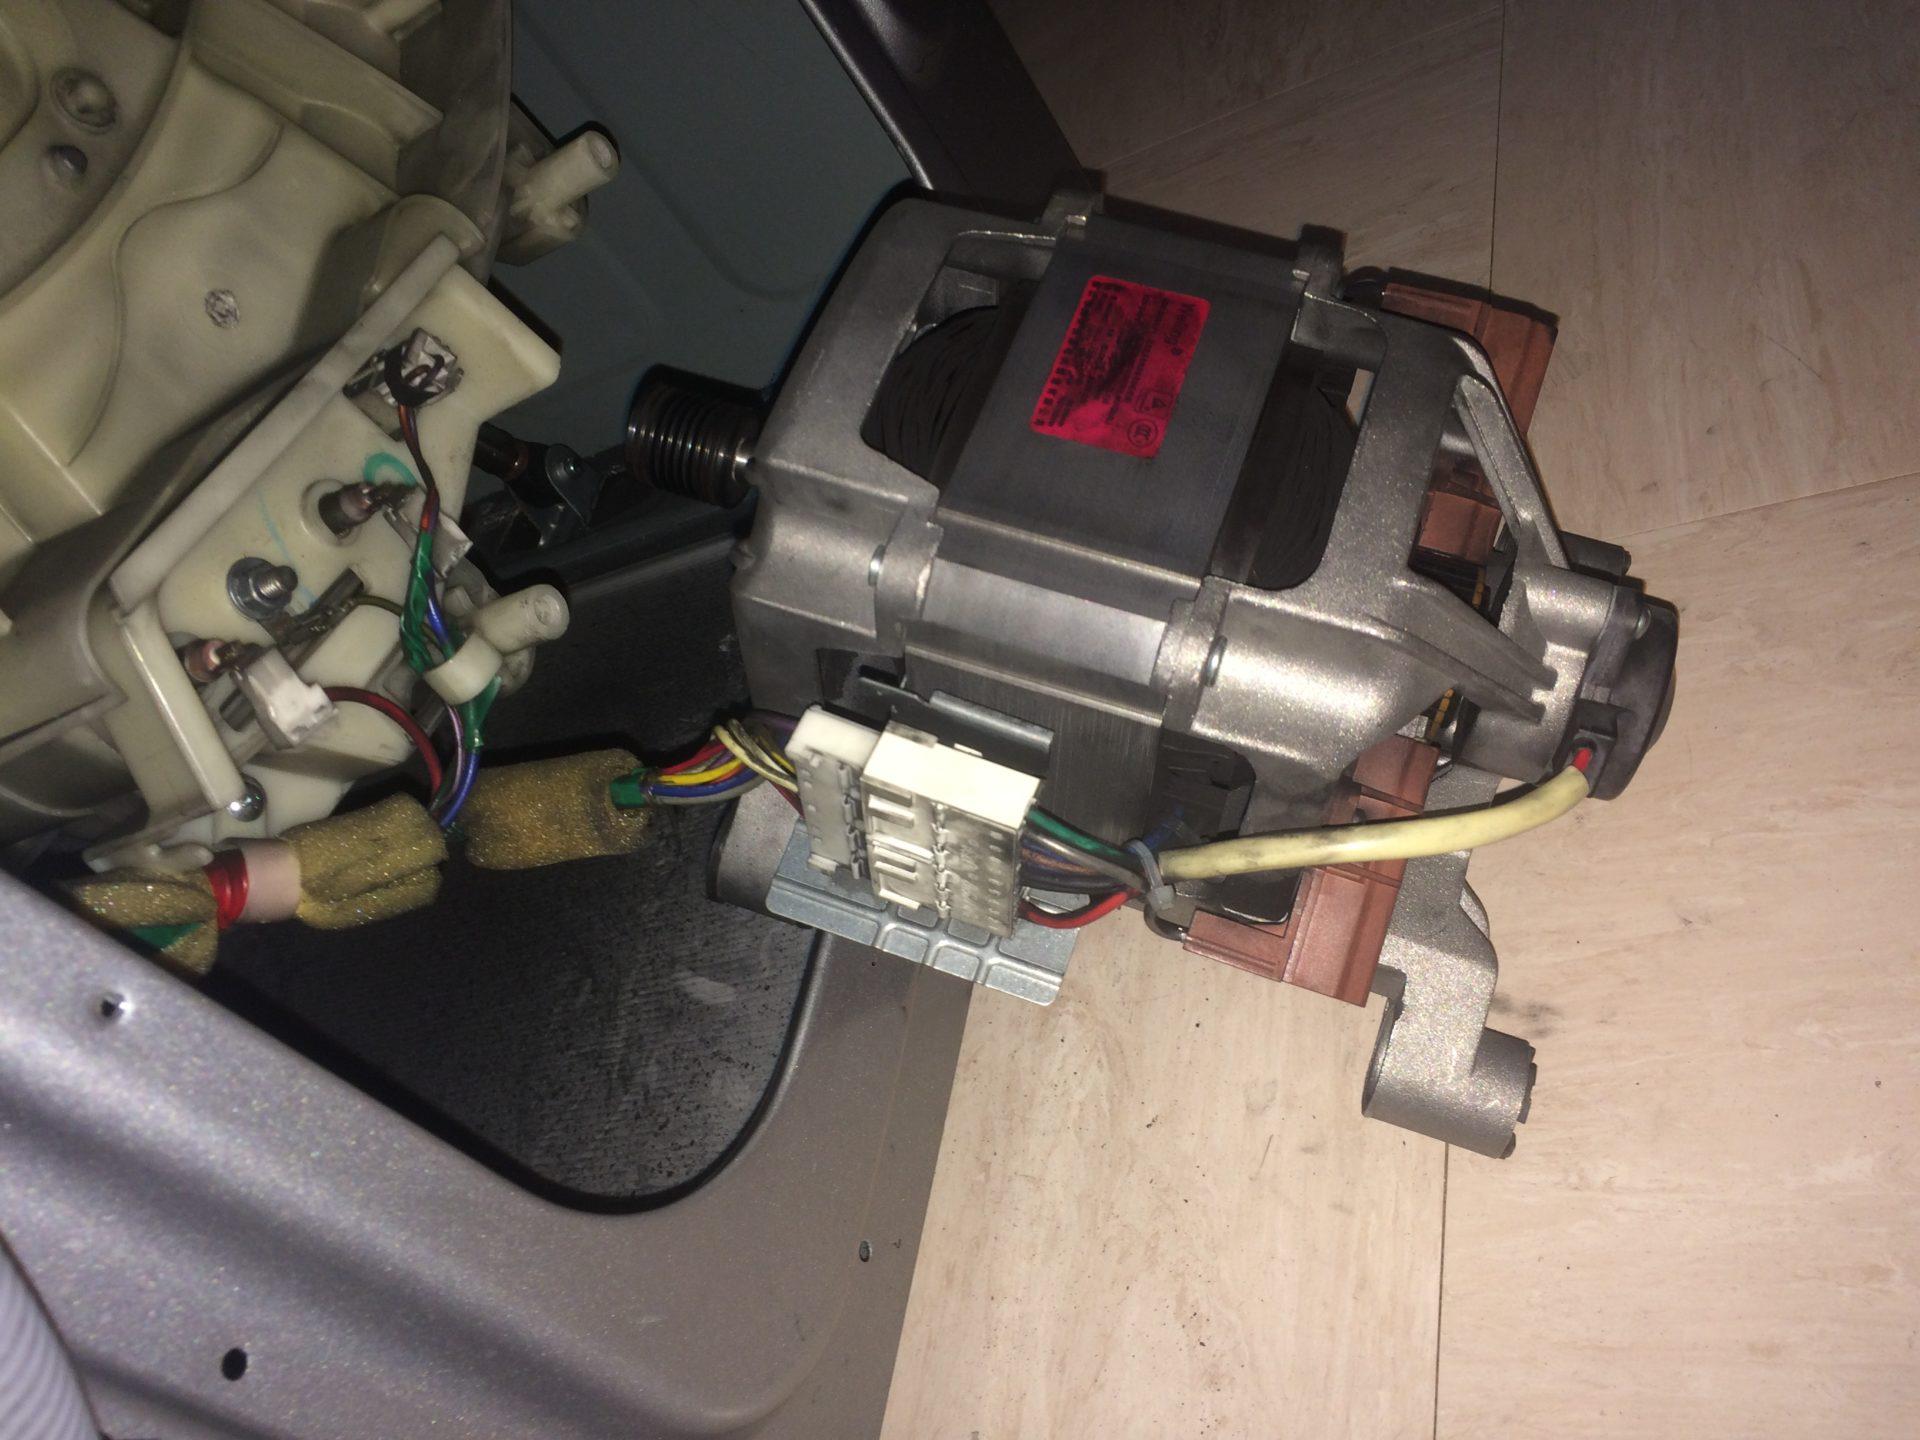 Samsung WF1804WPN washing machine 3E error not spining